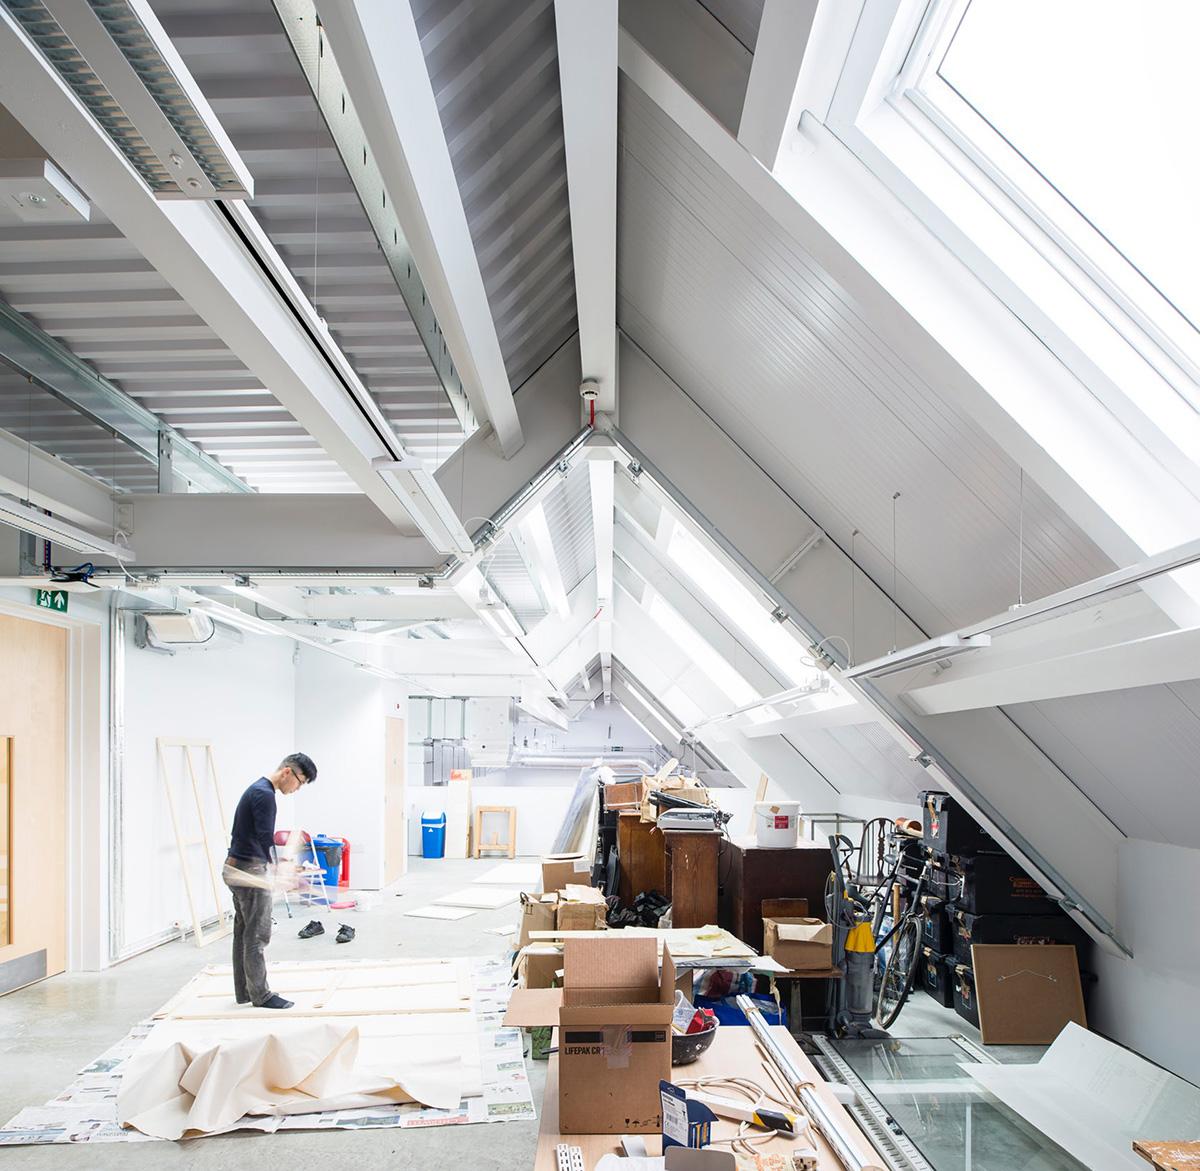 06-the-ruskin-school-of-art-spratley-studios